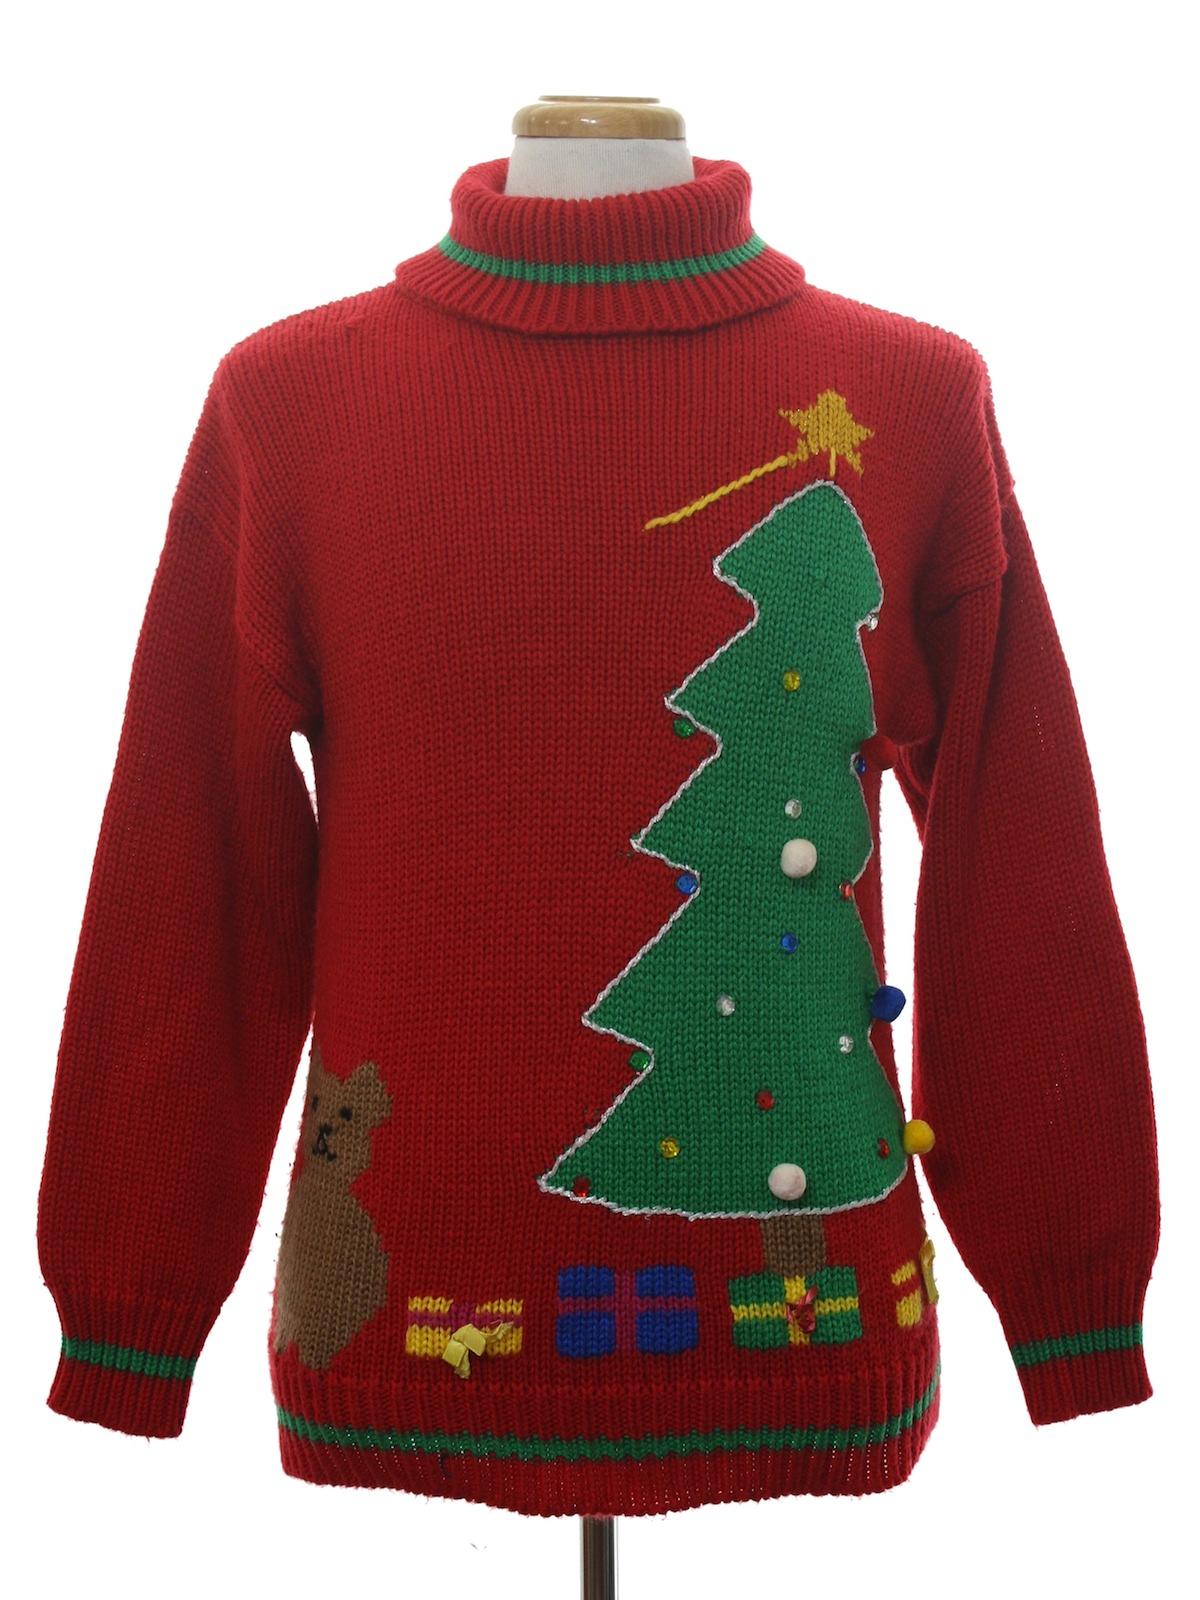 3bd0cb6672c4 80s Vintage Ugly Christmas Sweater (Bravo!): 80s authentic vintage ...